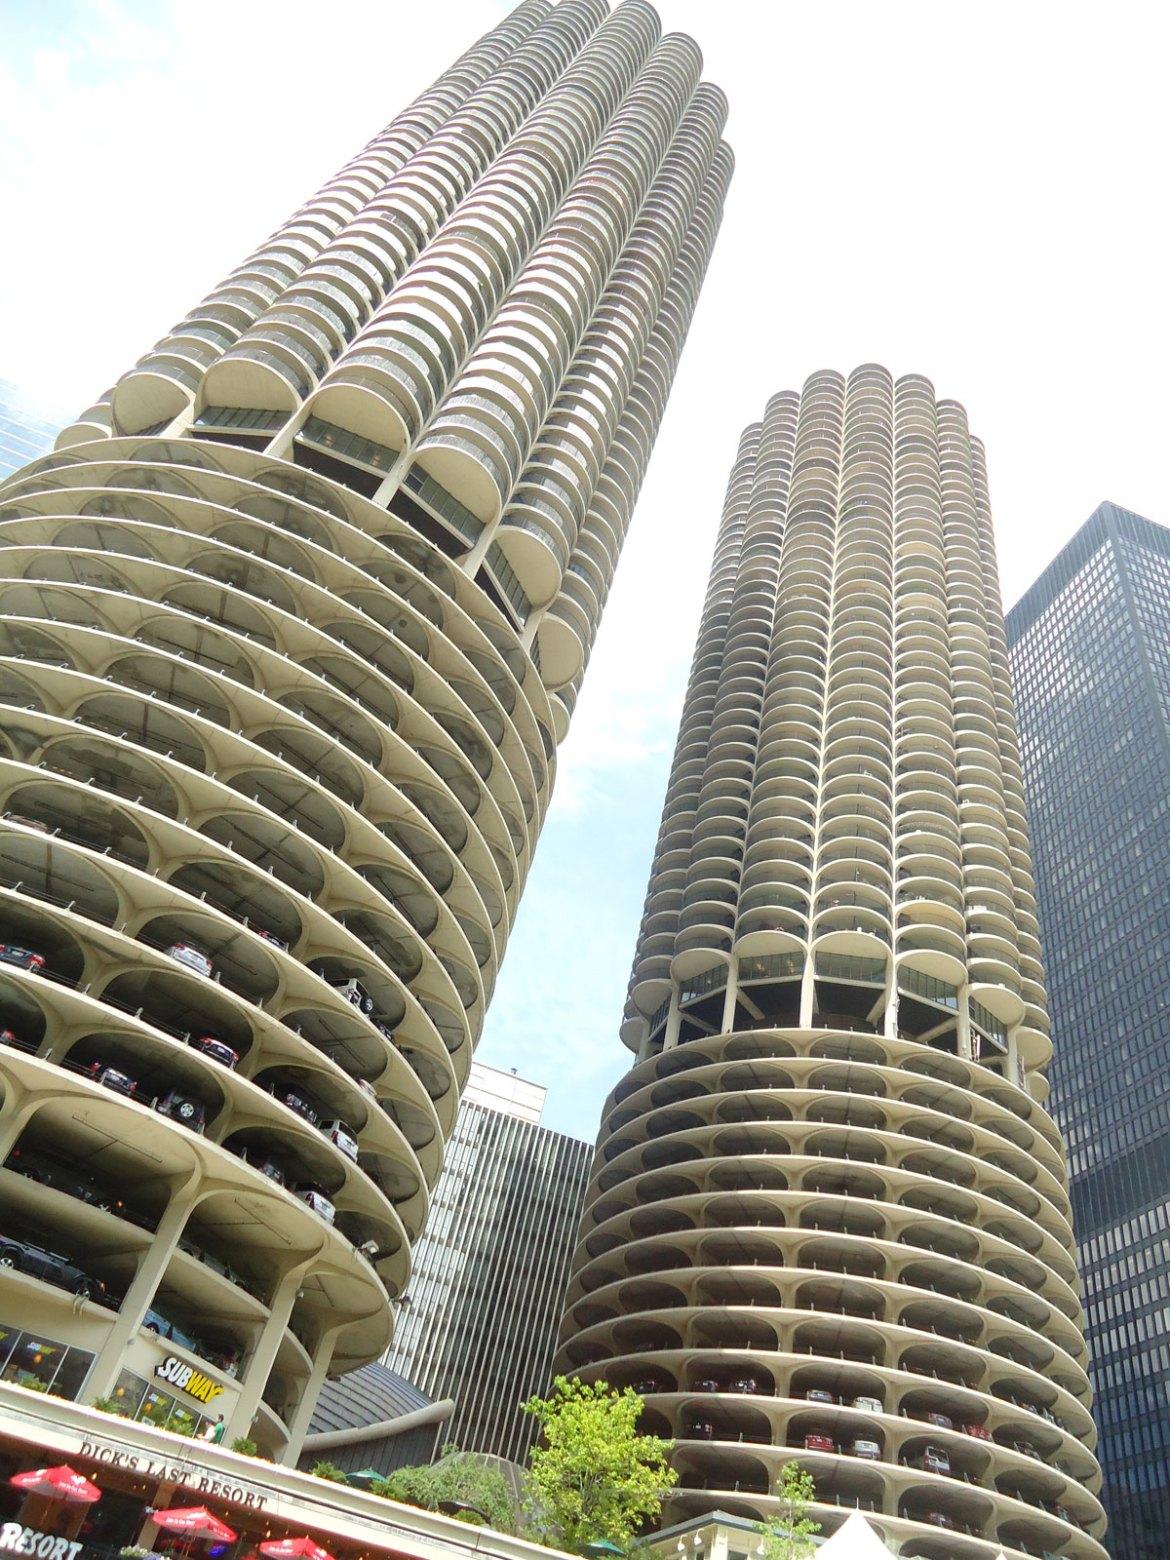 chicago-architecture-river-cruise-8